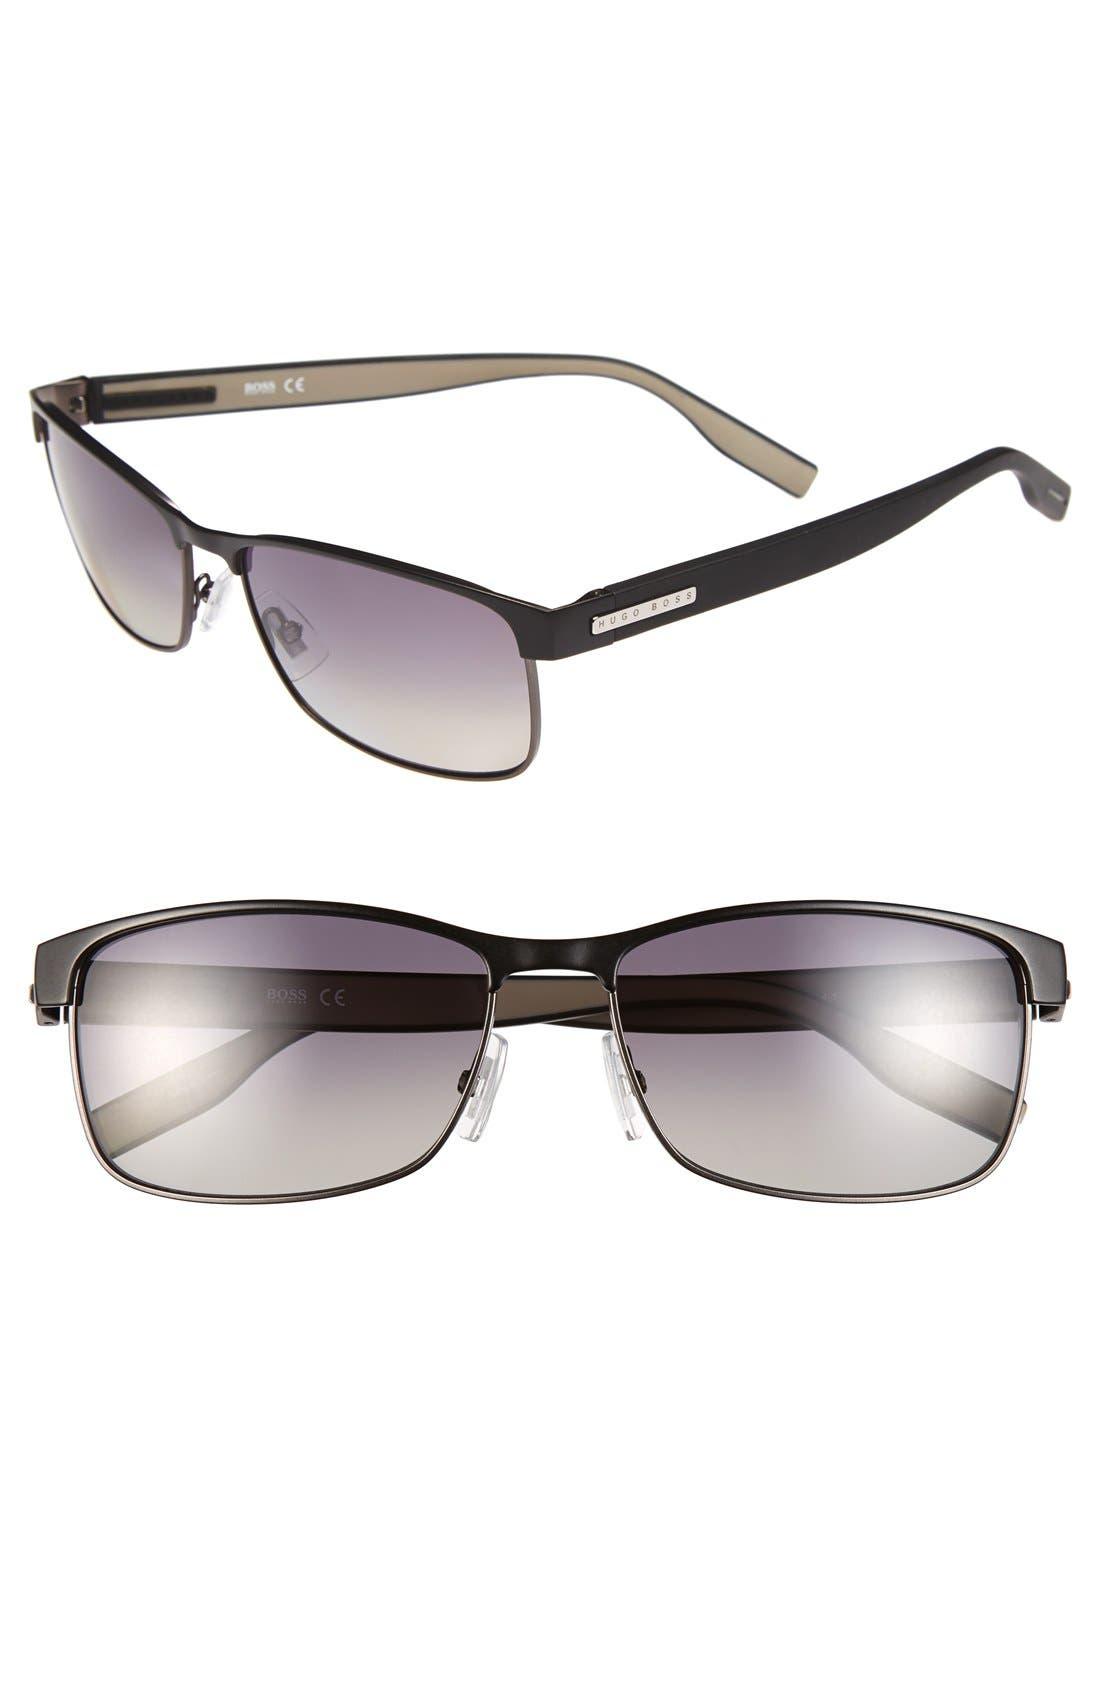 Alternate Image 1 Selected - BOSS 58mm Polarized Sunglasses